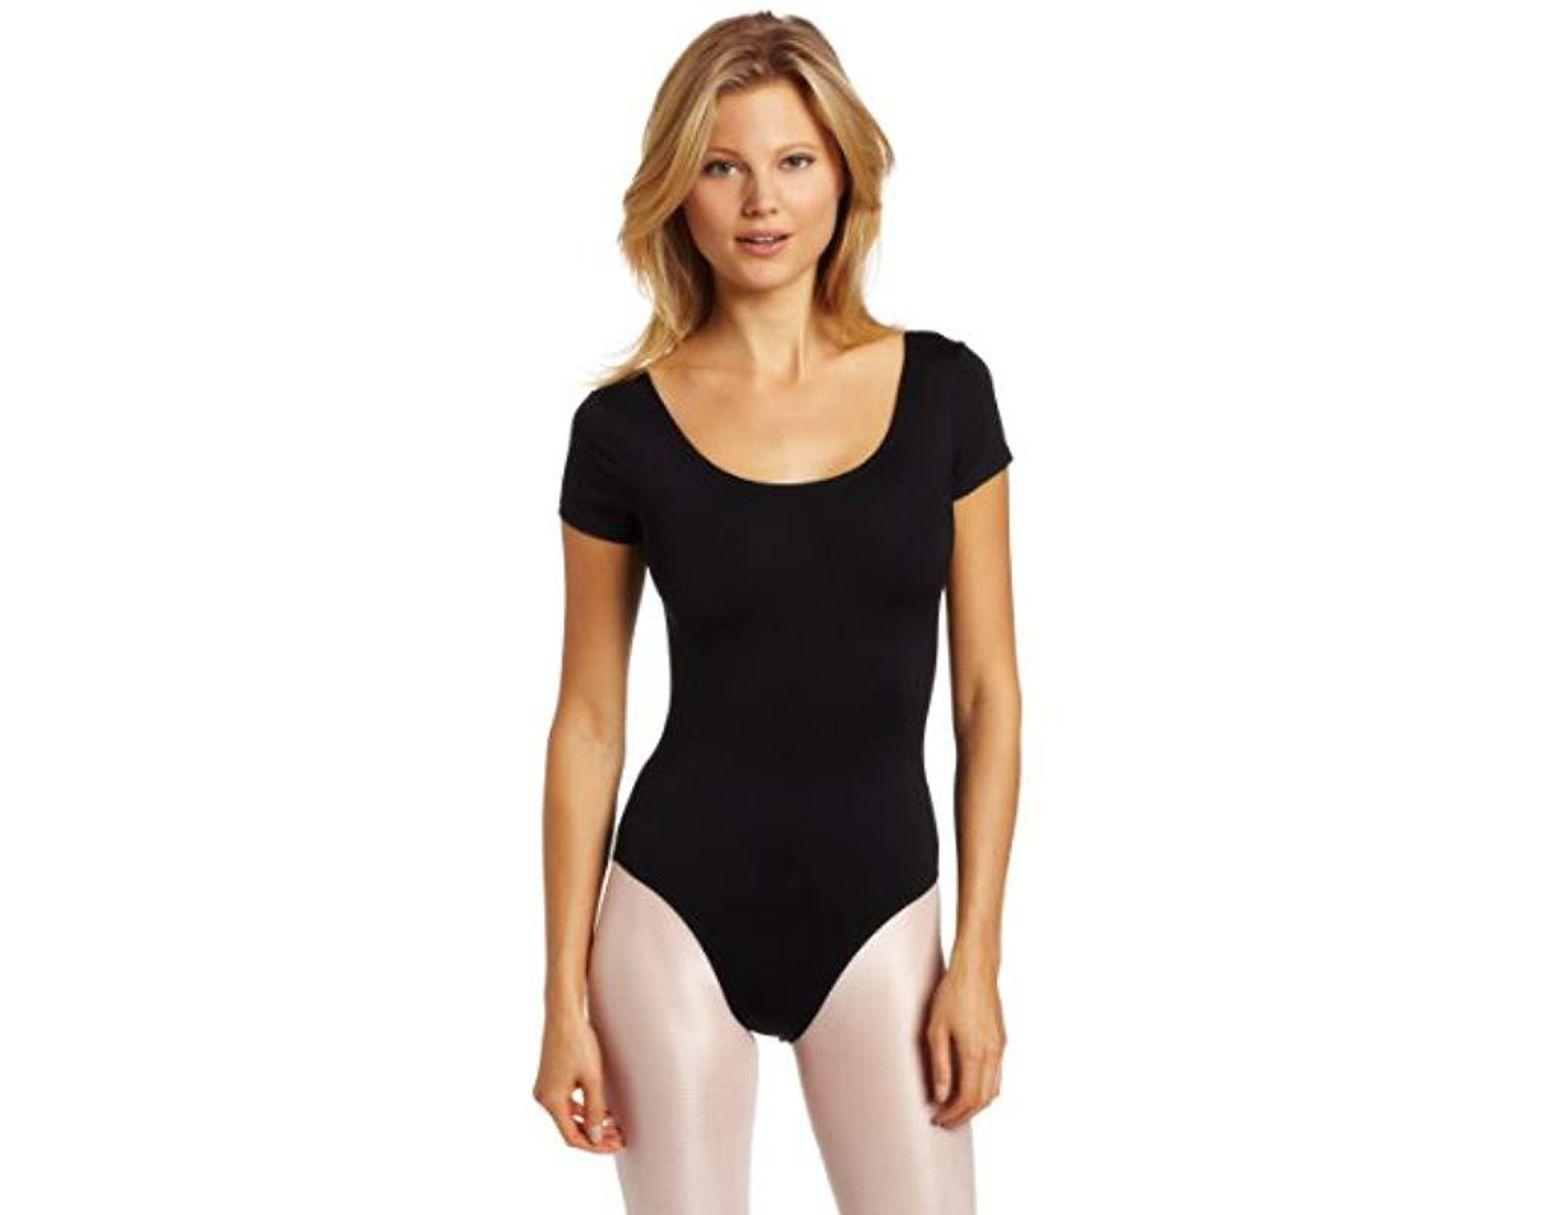 fd45baf15c5ea Women's Black Short-sleeve Leotard